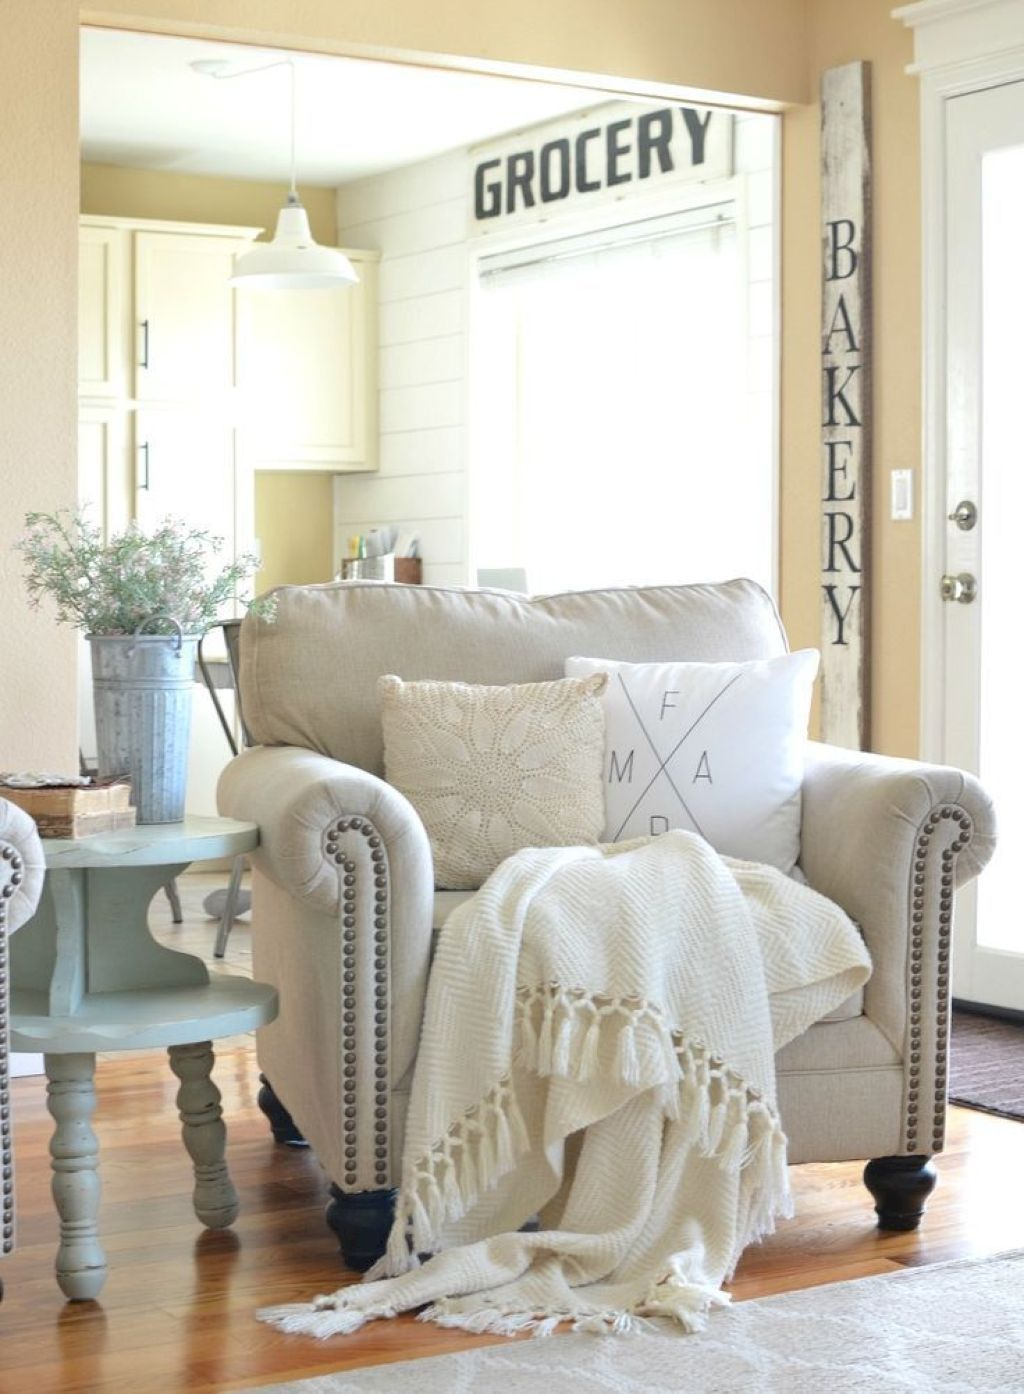 35 Best Modern Farmhouse Living Room Decor Ideas  Modern Adorable Farmhouse Living Room Design Ideas Inspiration Design